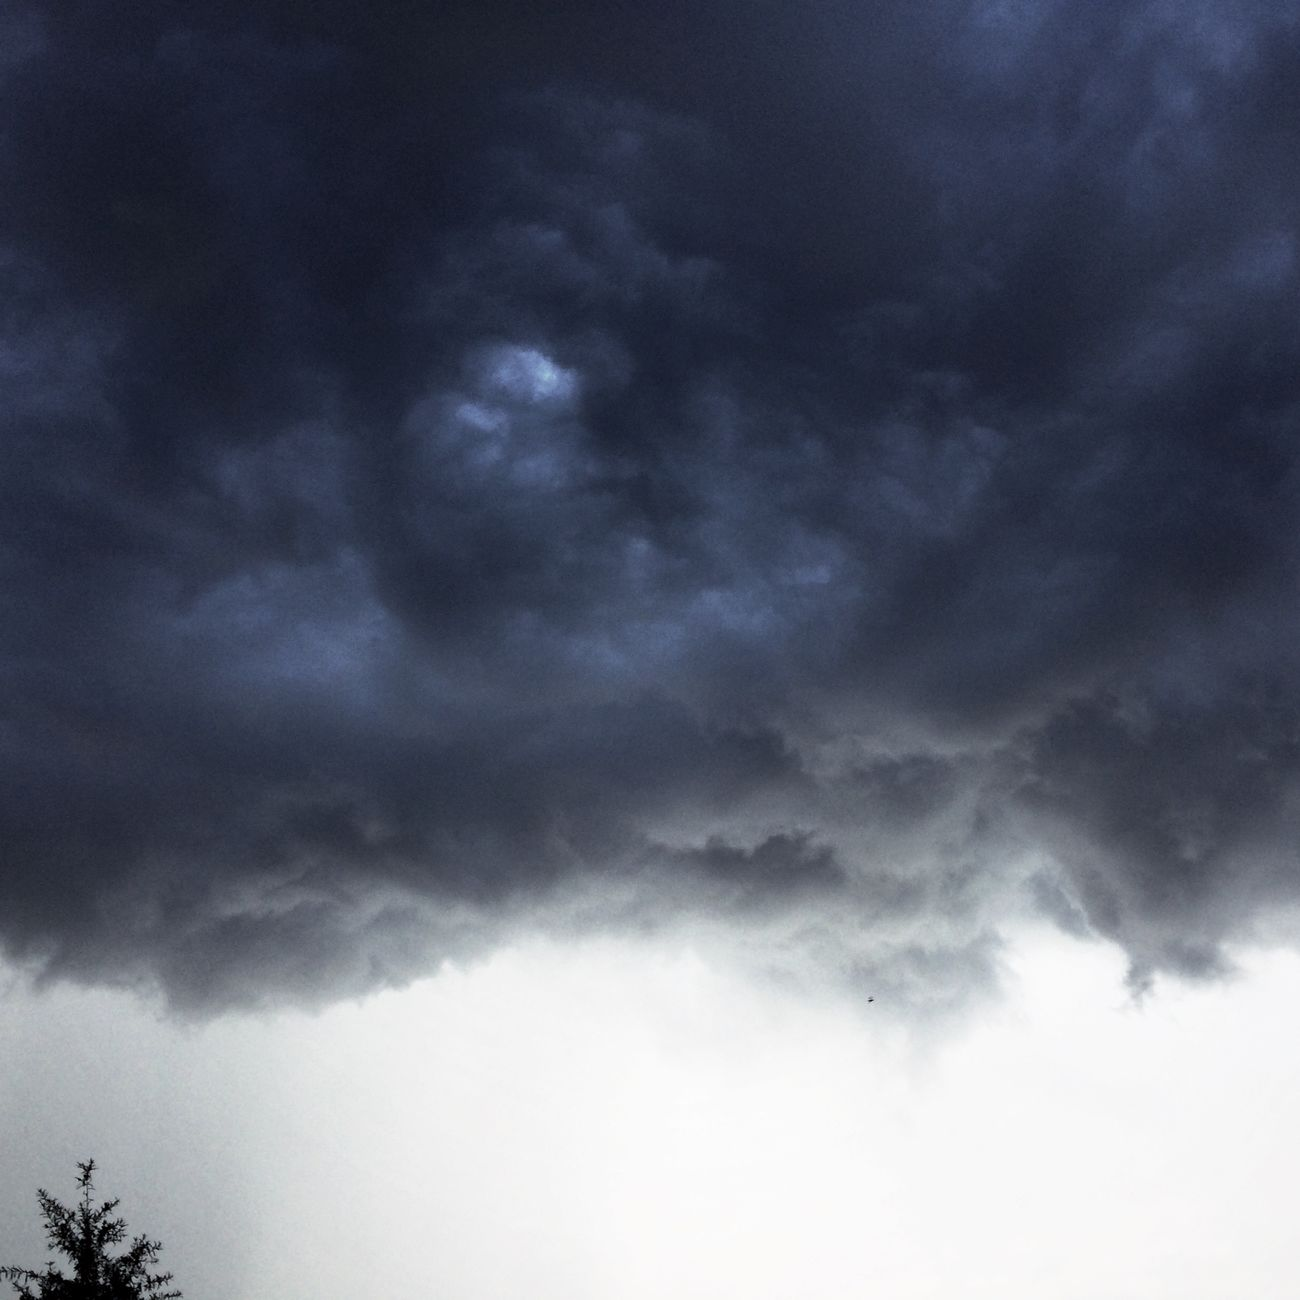 Capture The Moment Ominous Stormcoming BraceYourself Sobig RainIsComing Downpour Rain B&w GeeNiusPix